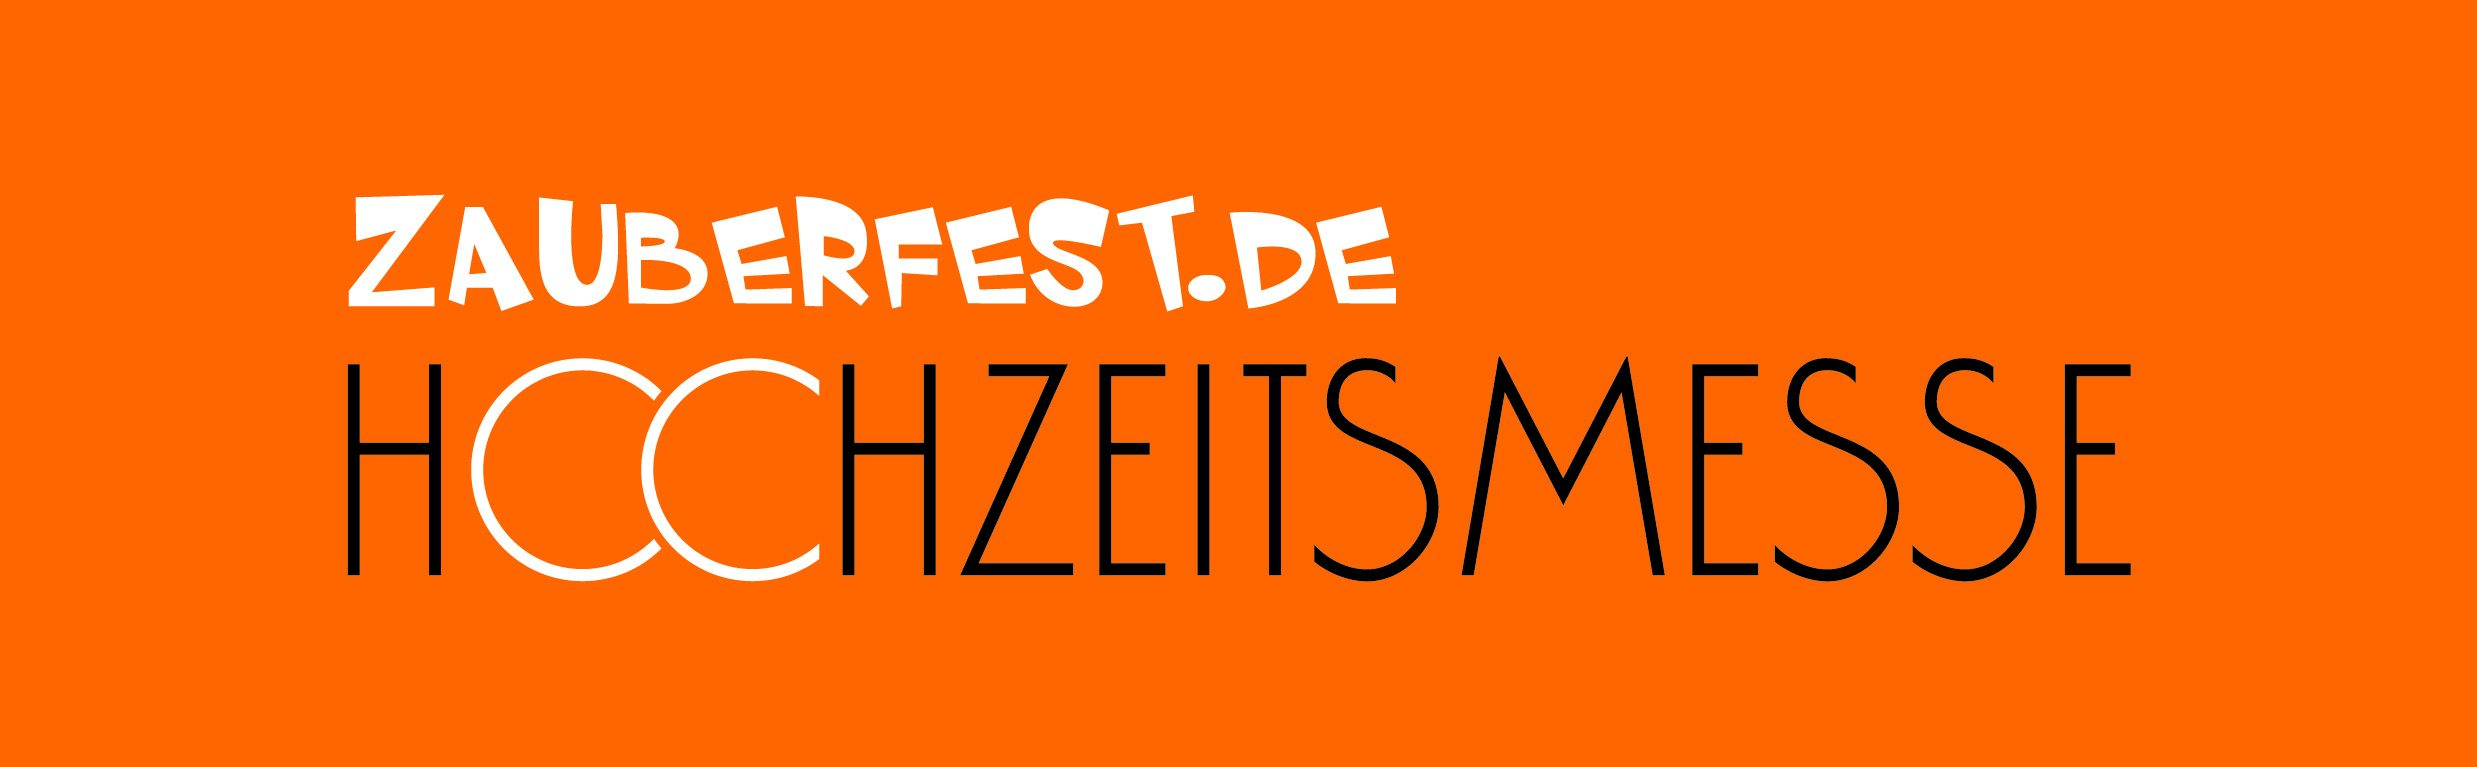 Logo Zauberfest.de Landshut